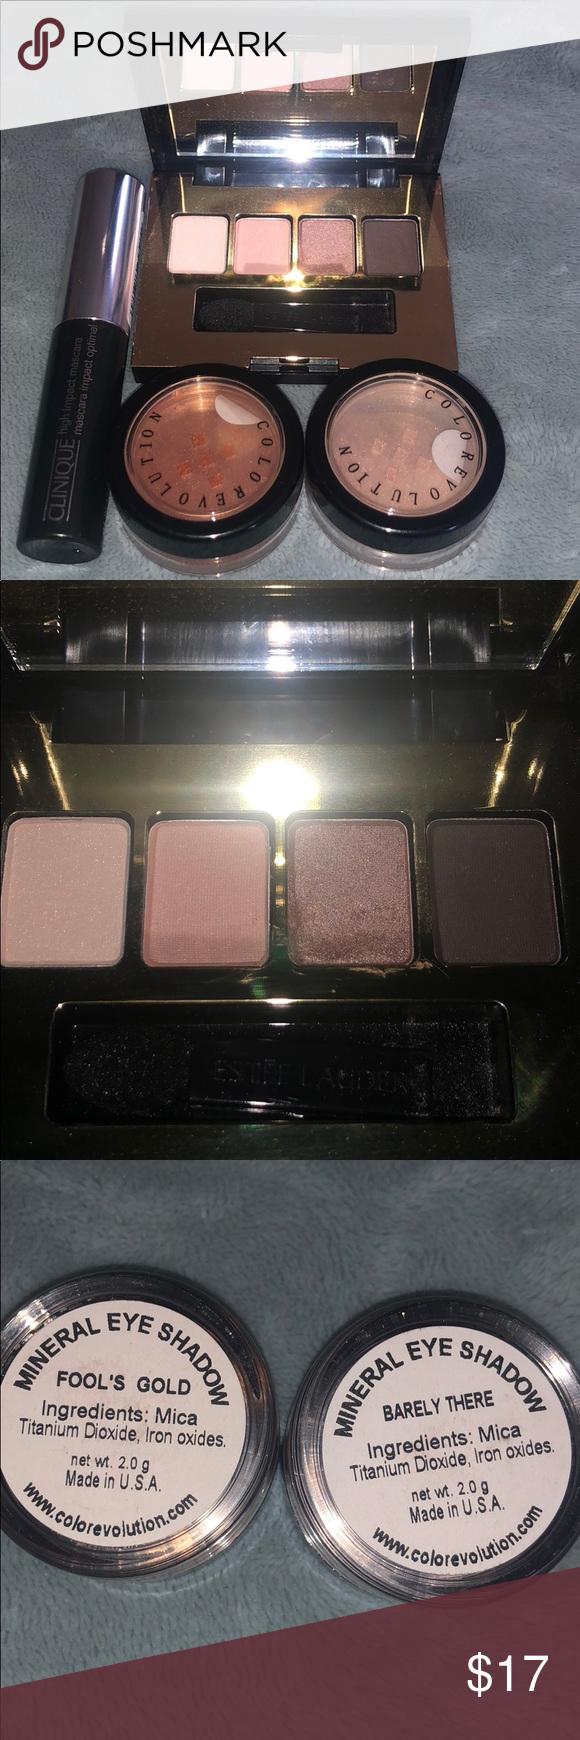 Eye makeup combo Estēe Lauder mini eyeshadow pallete 4